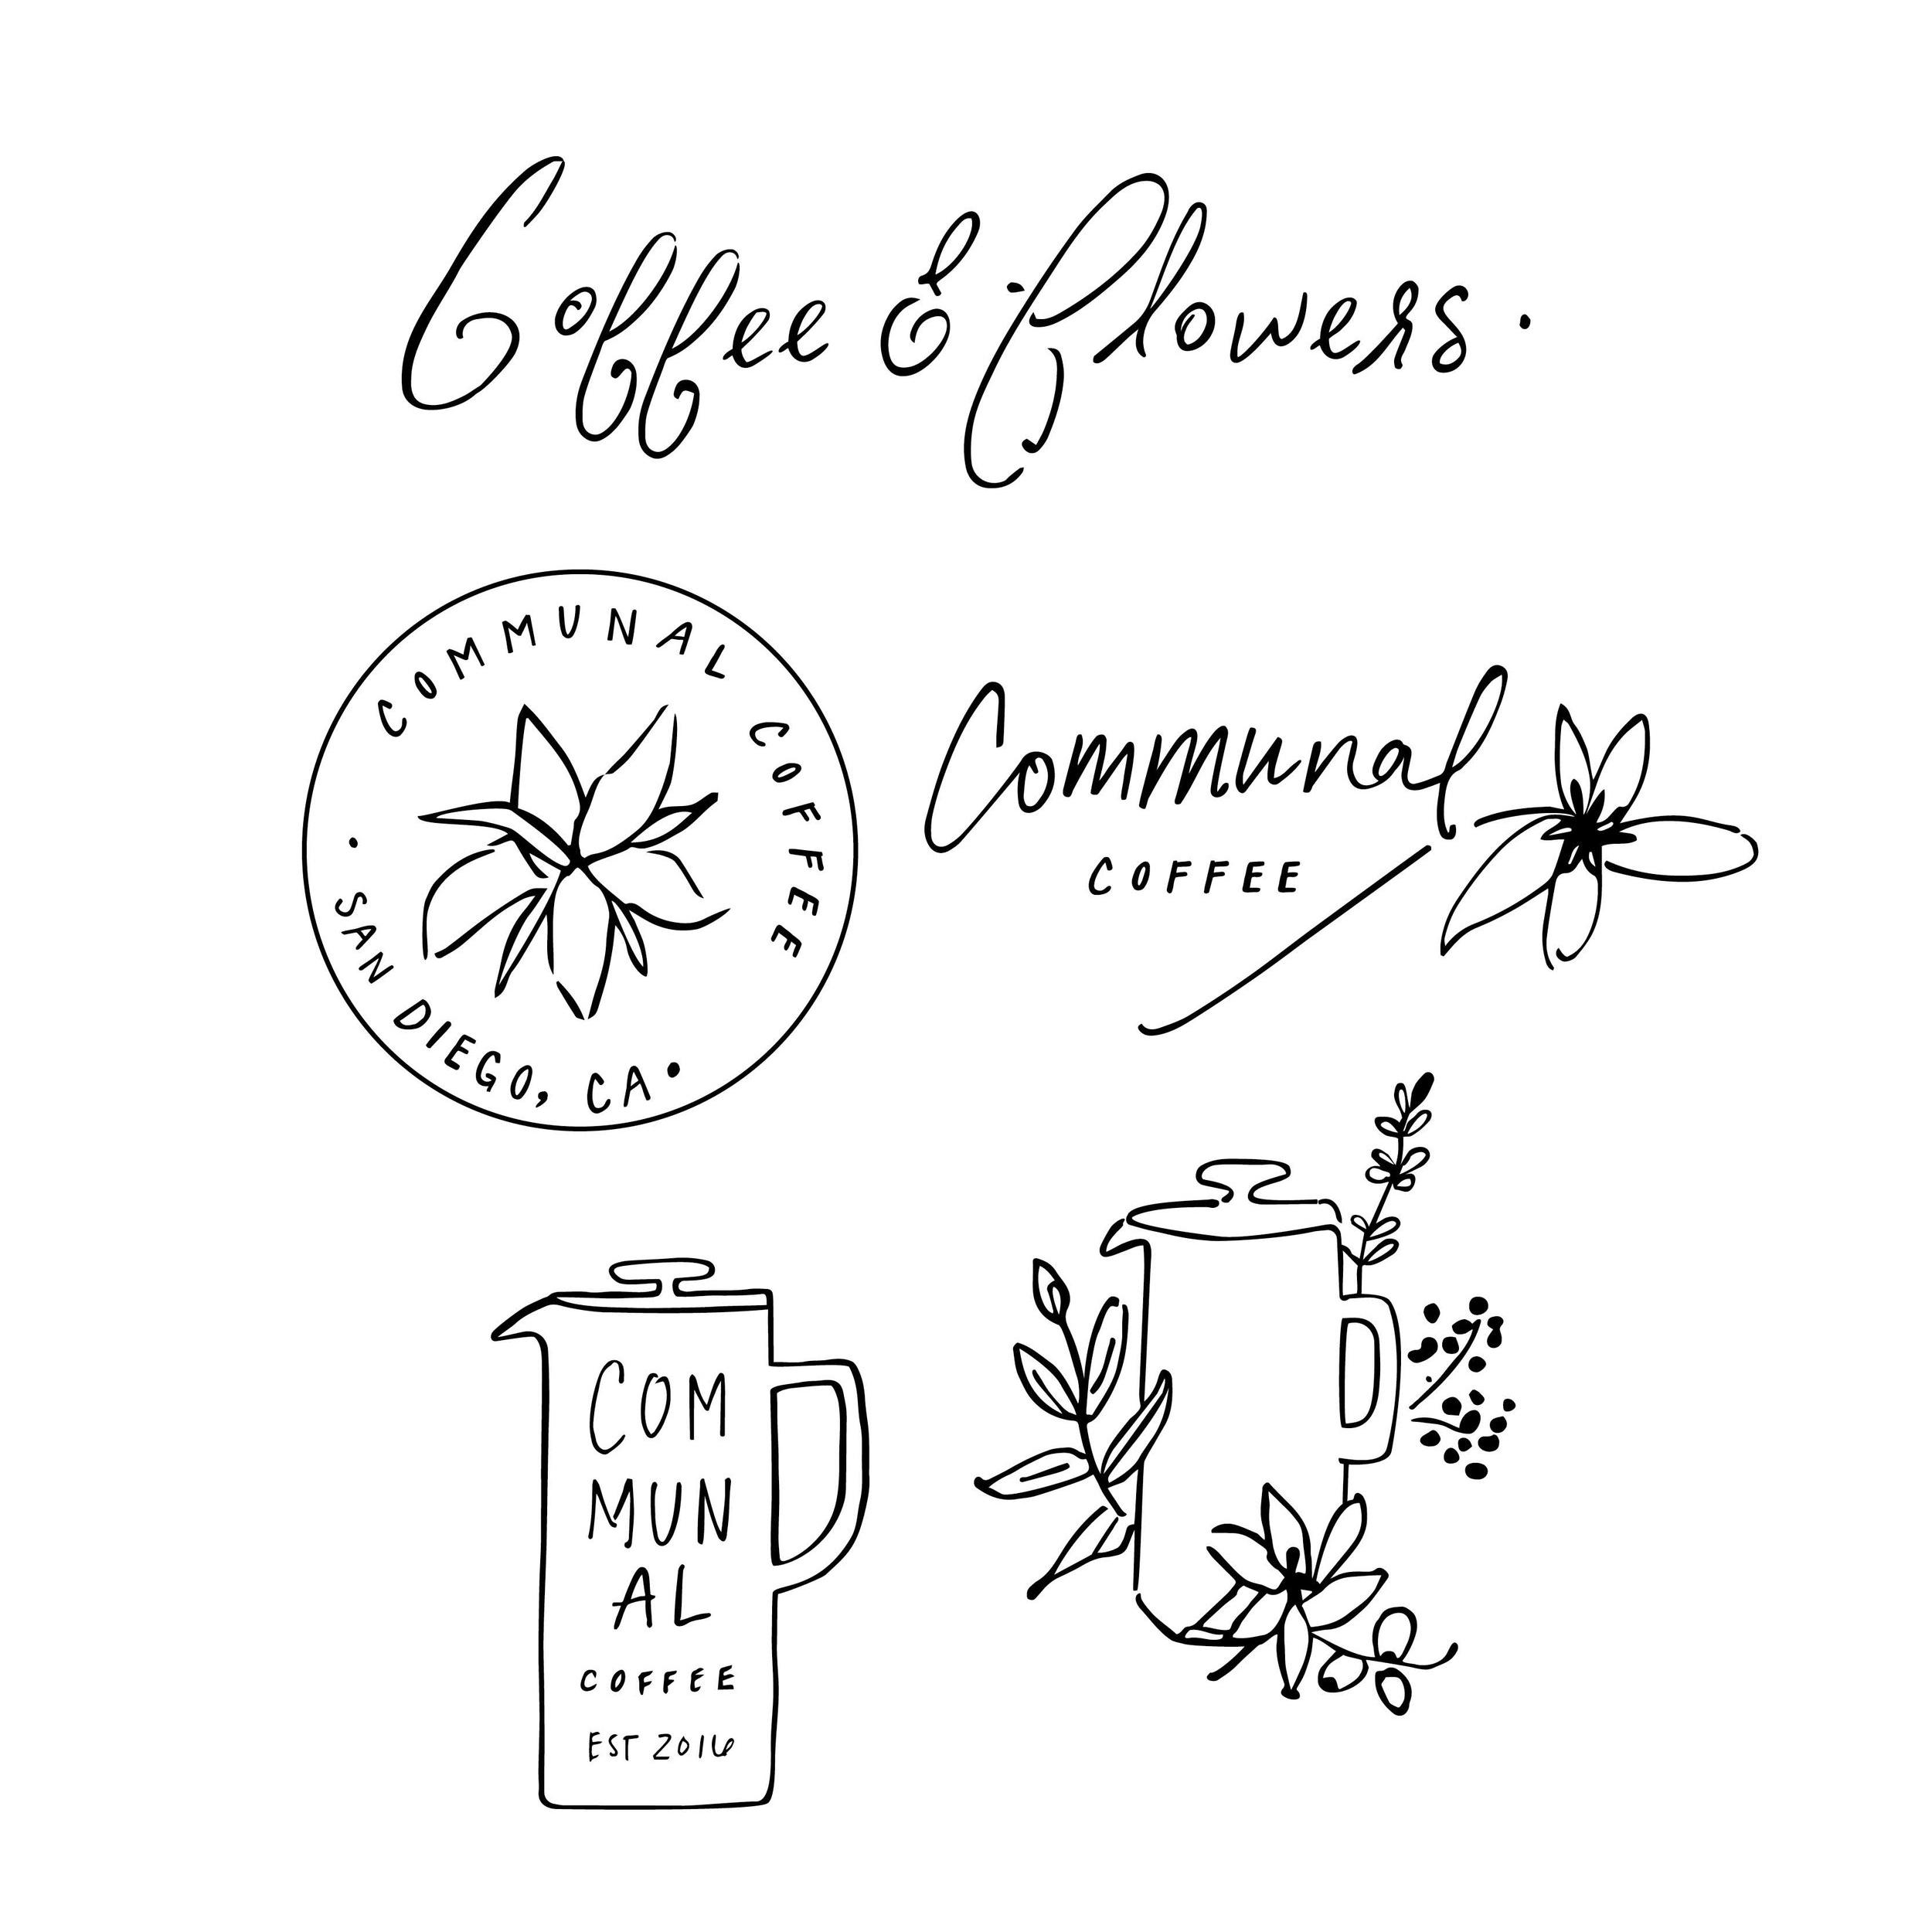 communal_coffee_insta3.jpg